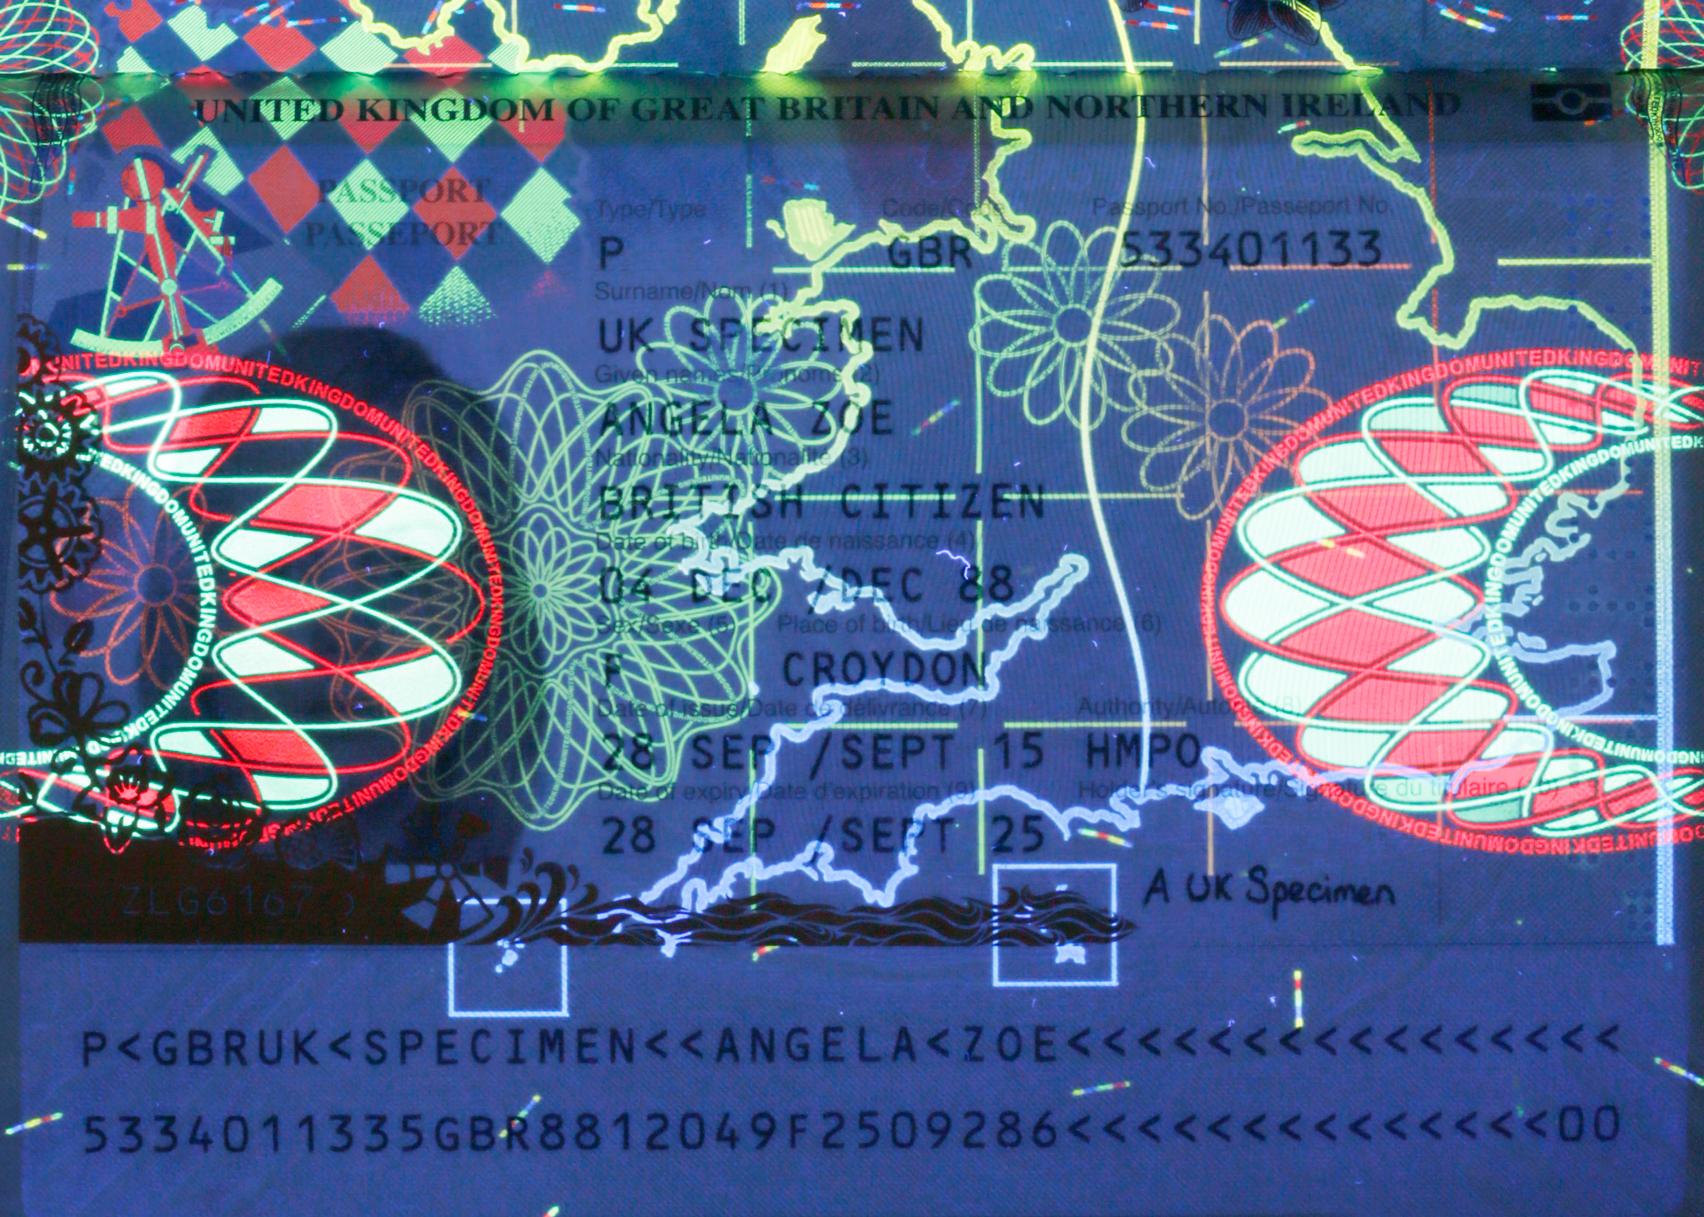 British passport design makes national identity